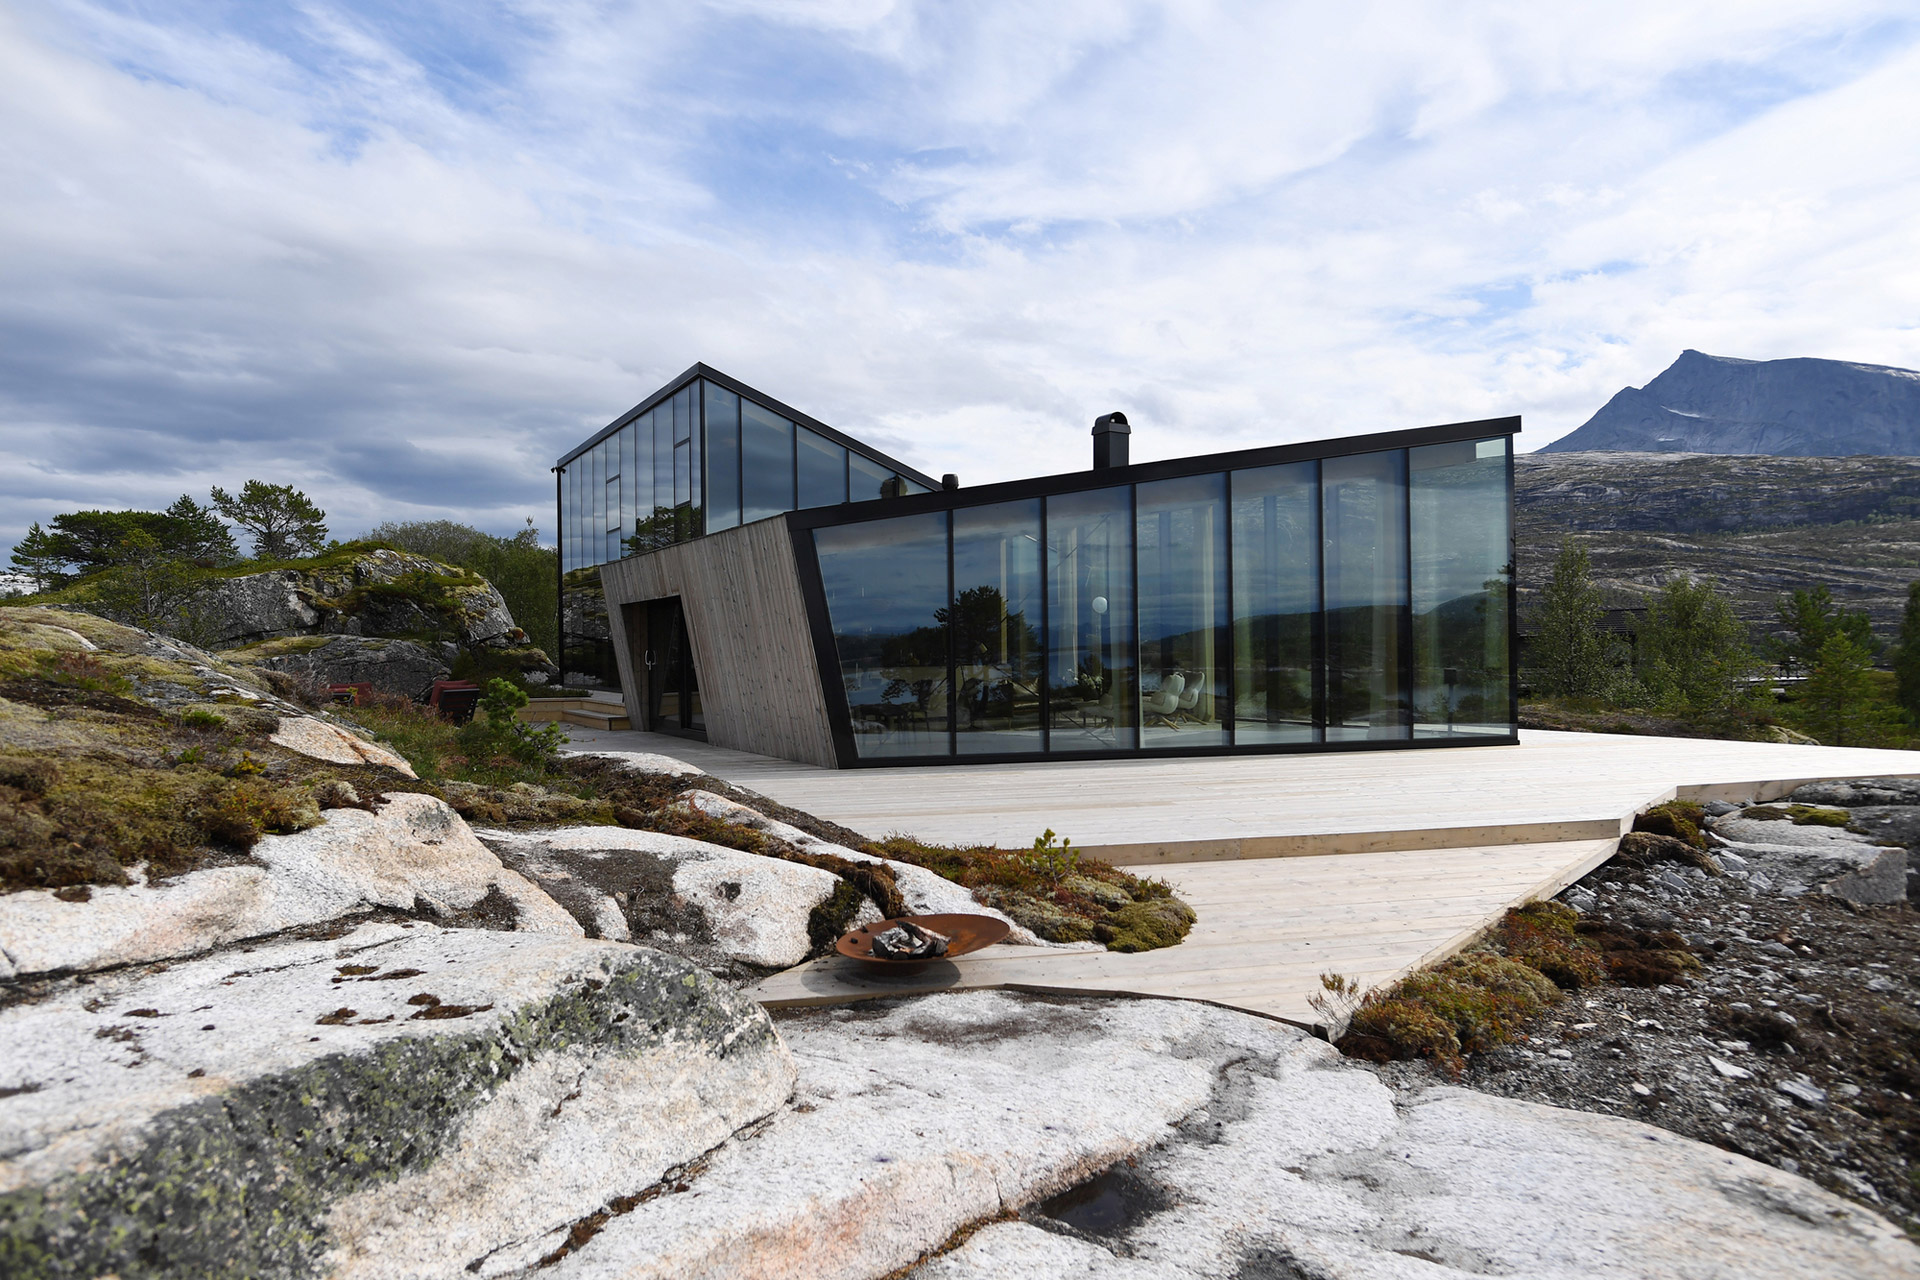 Efjord Retreat Cabin